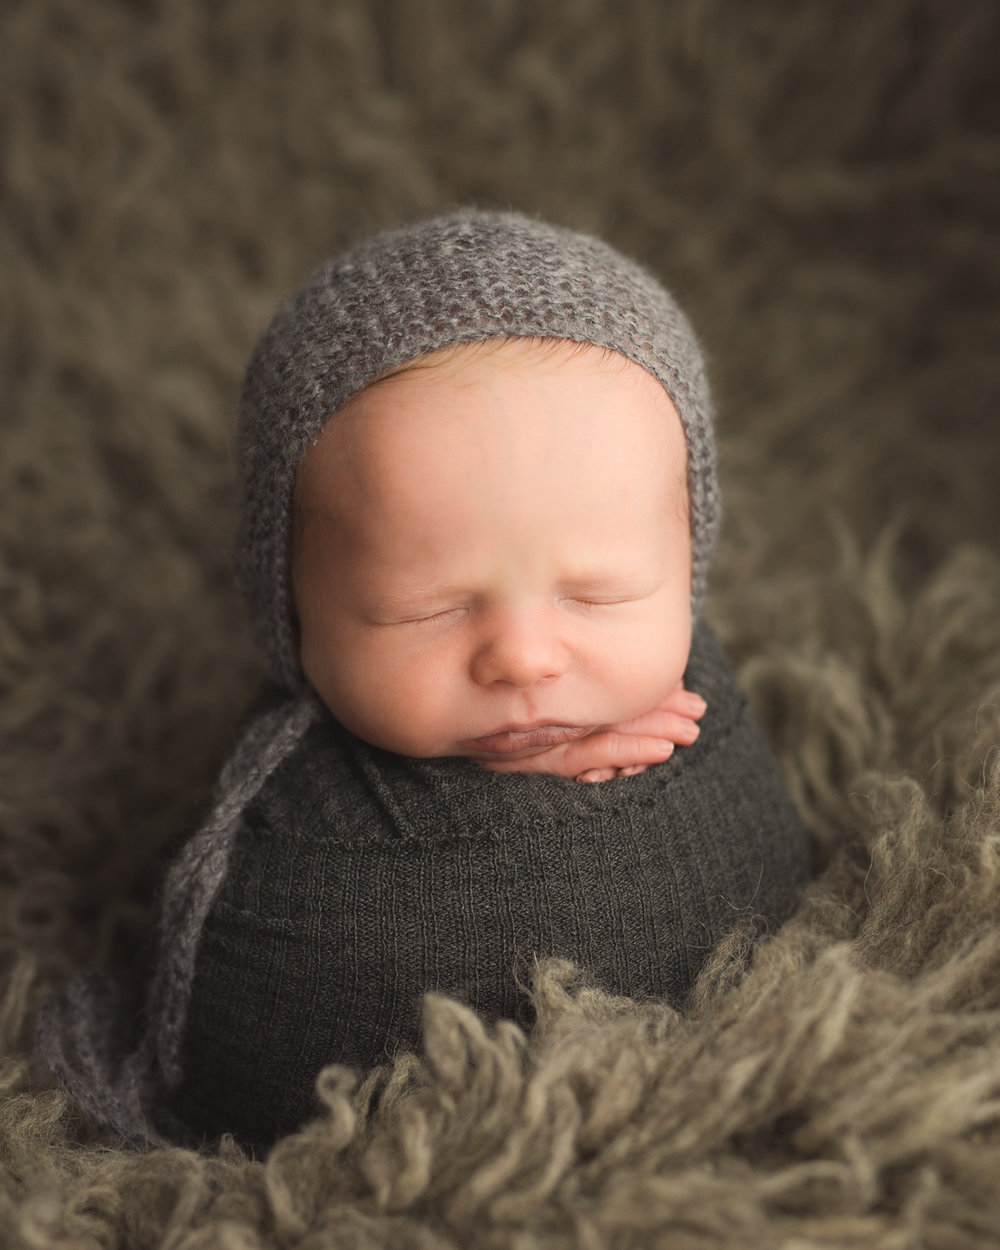 Sarah Borchgrevink Photography - Houston's Best Newborn Photographer